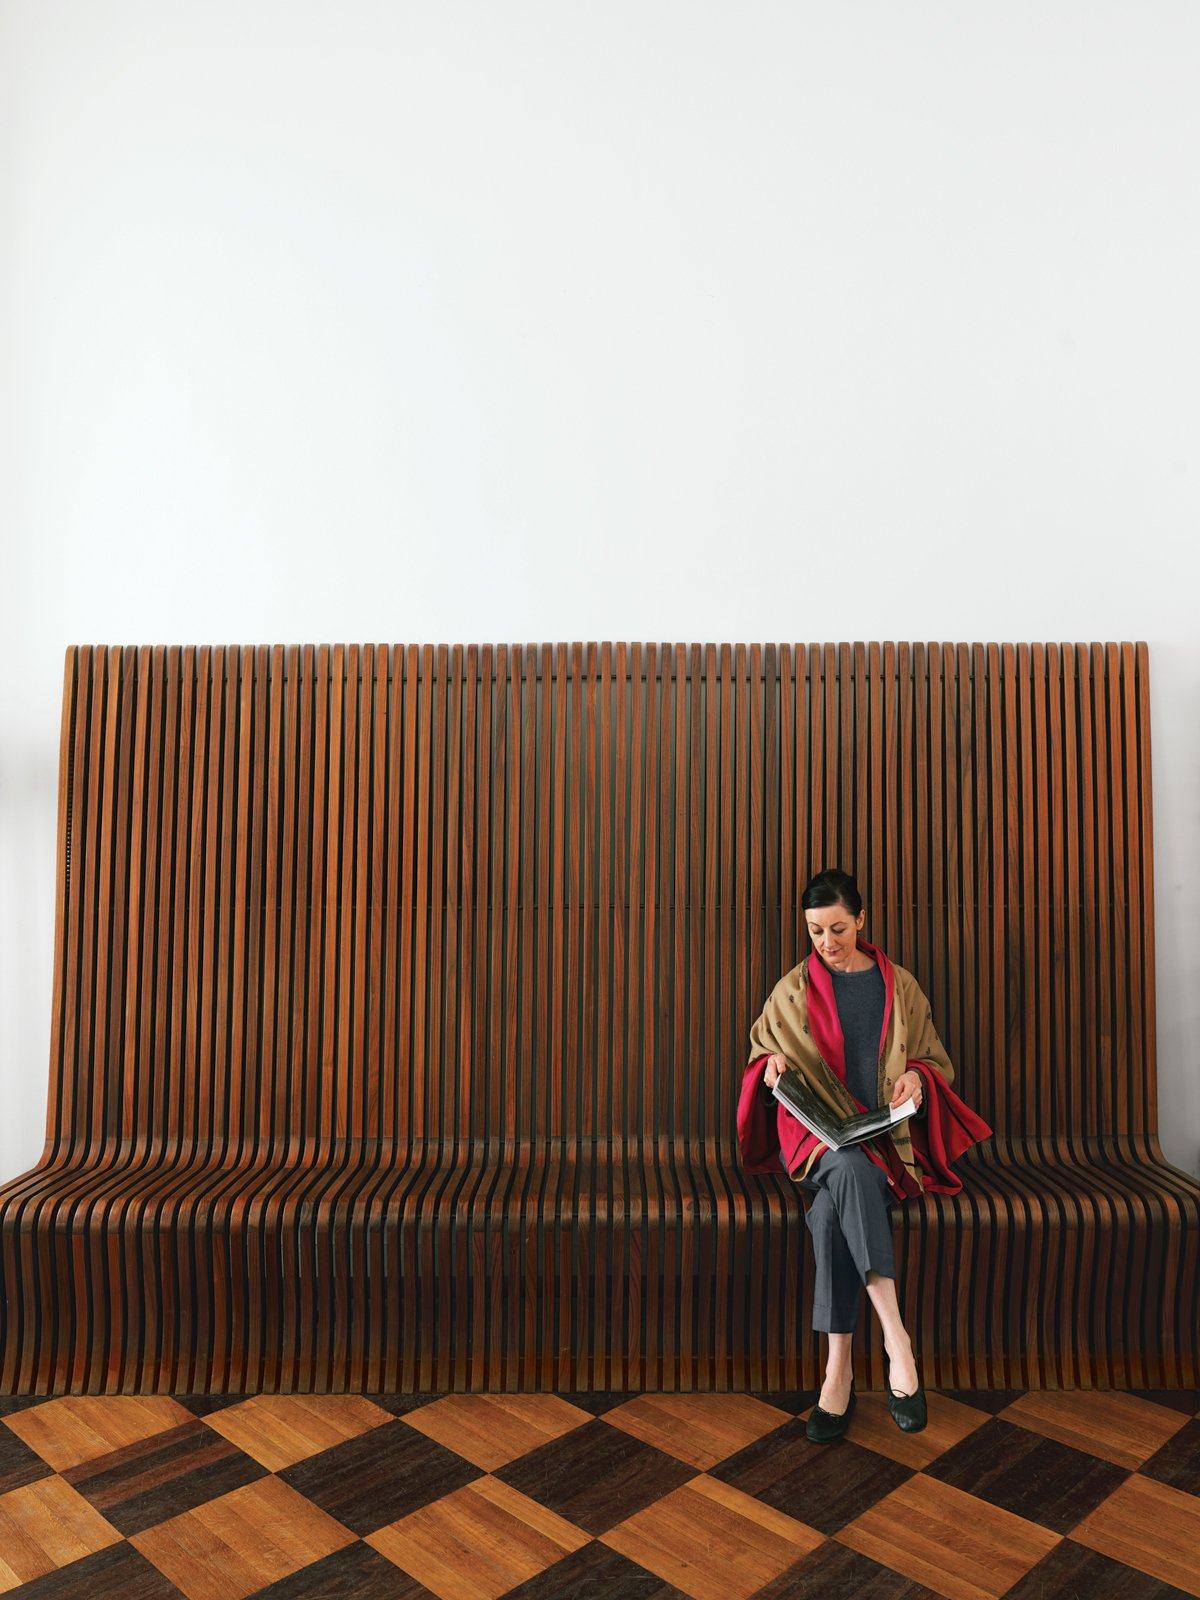 #seatingdesign #vintage #rosewood #bench #RichardSeifert #Brussels #mansion